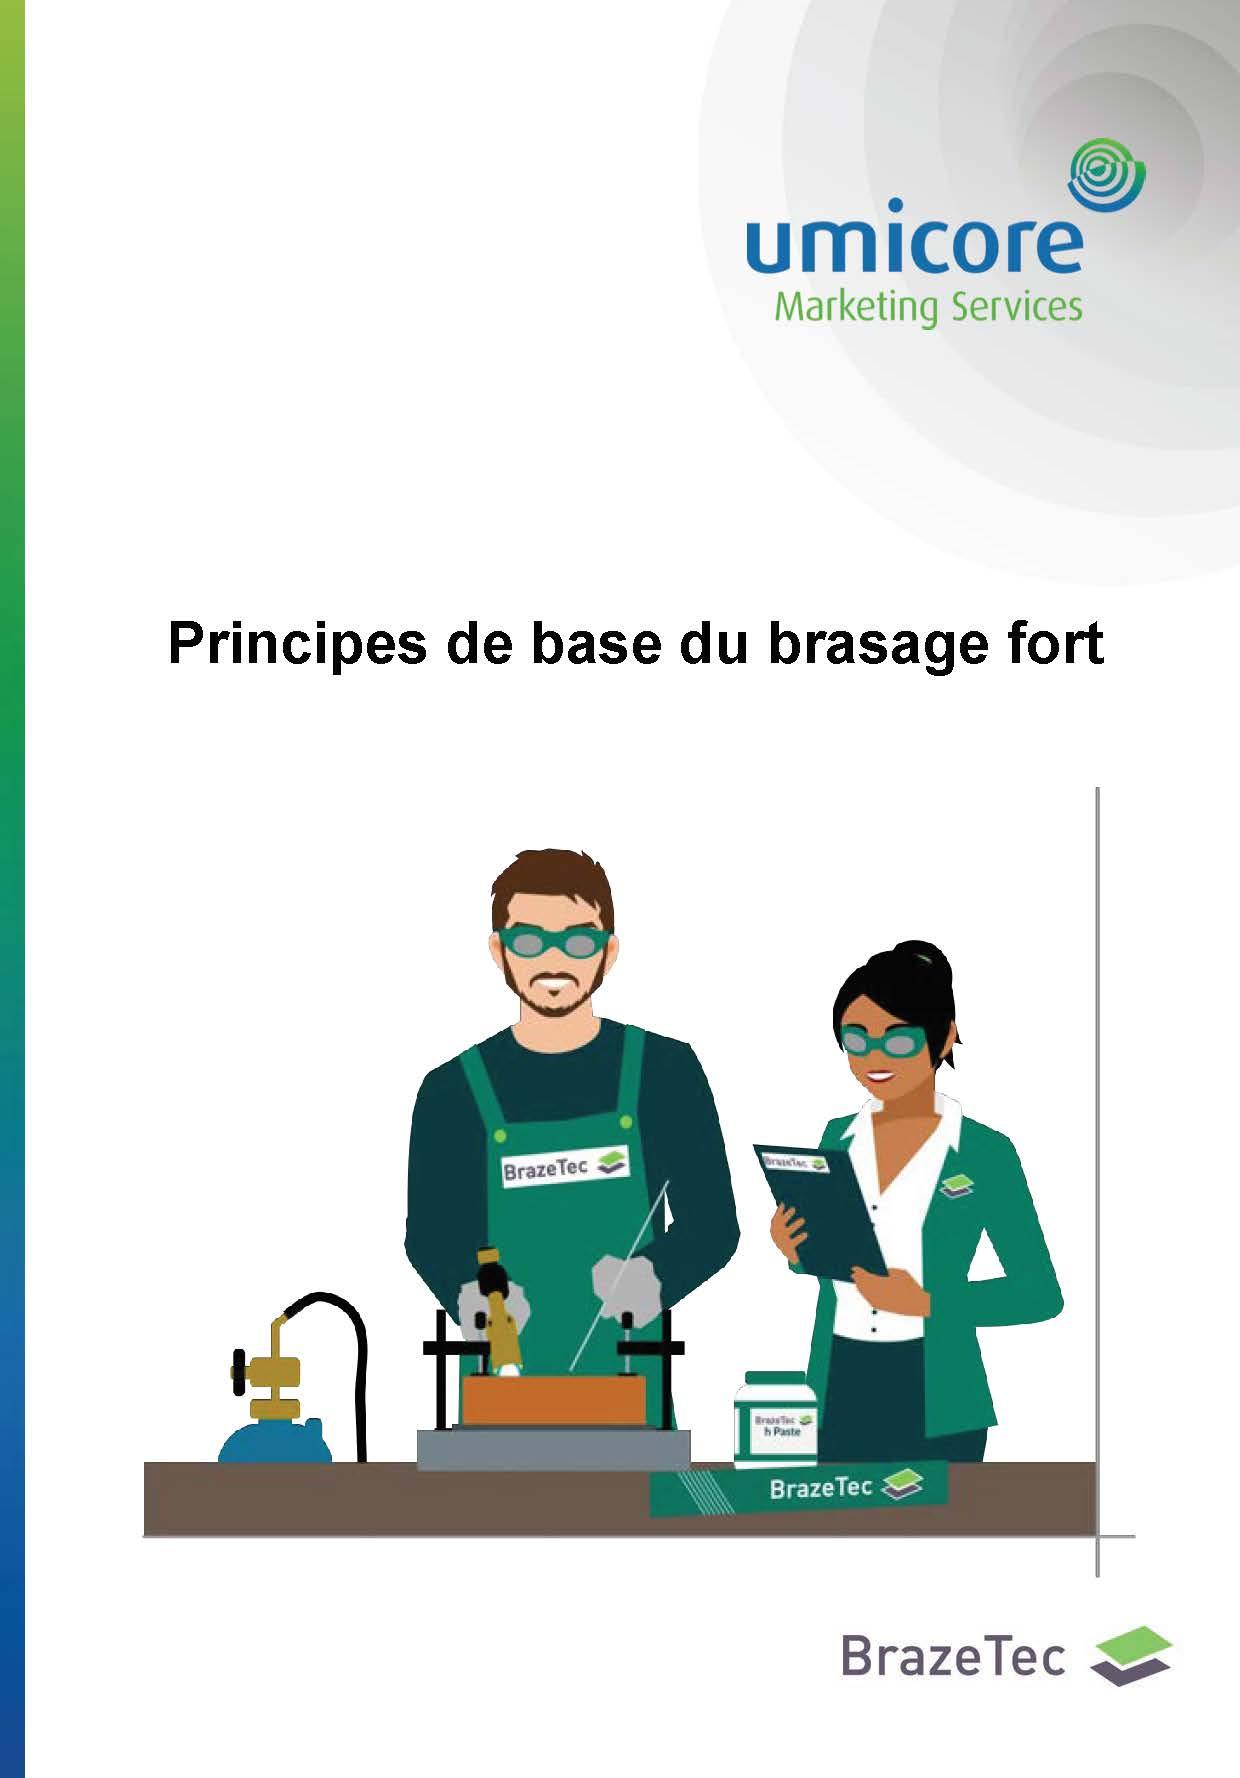 Umicore-BrazeTec-principes-de-brasage_01-2021_A4_Page_01